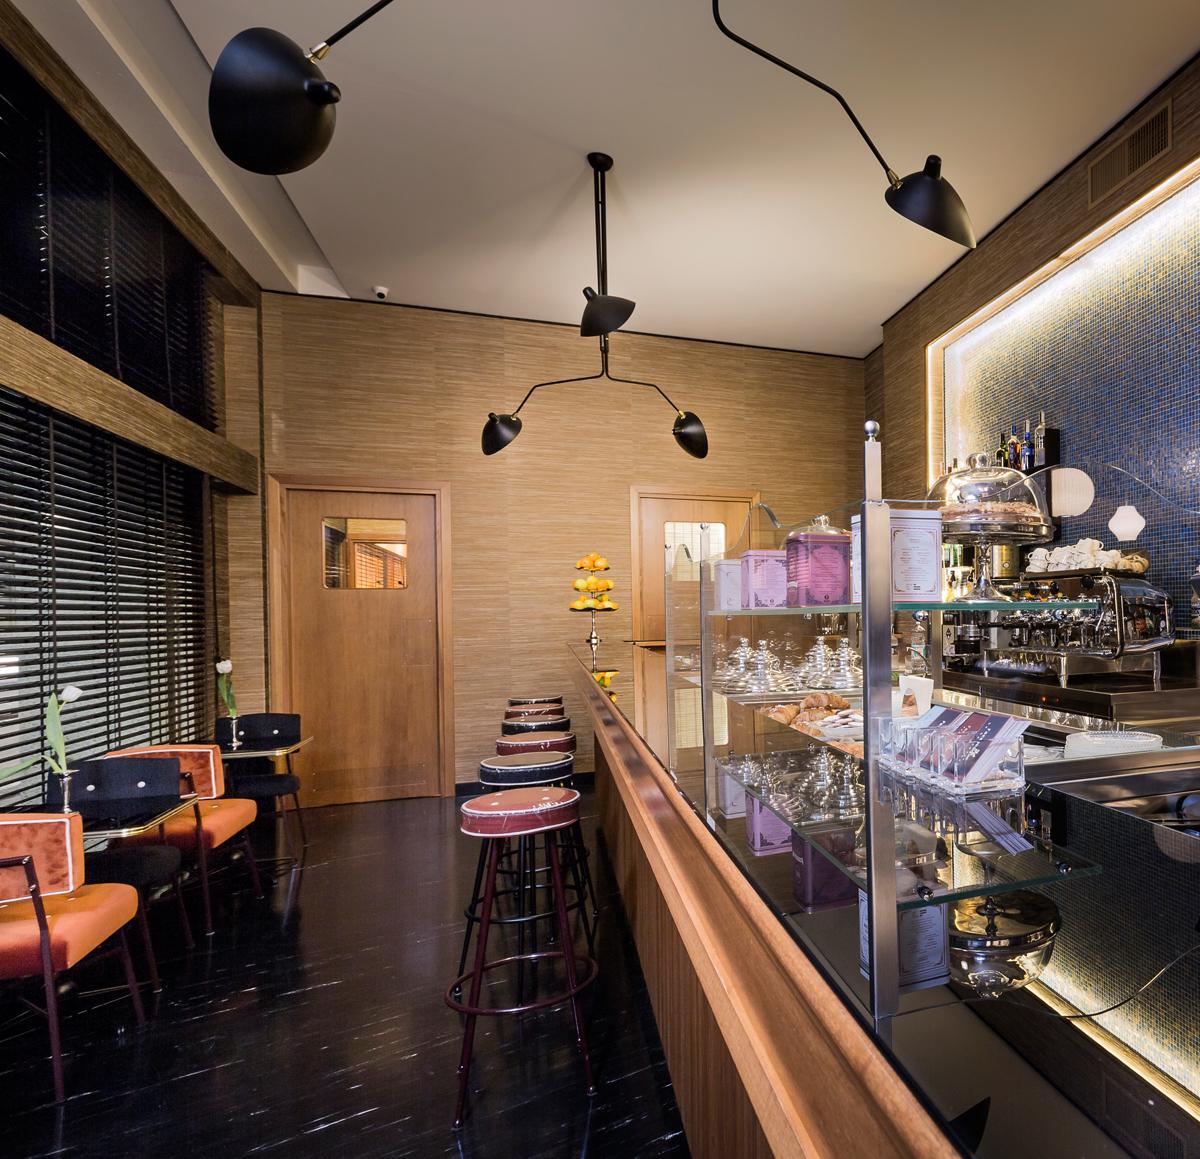 caffè stile vintage a milano - Negozi Arredamento Vintage Milano